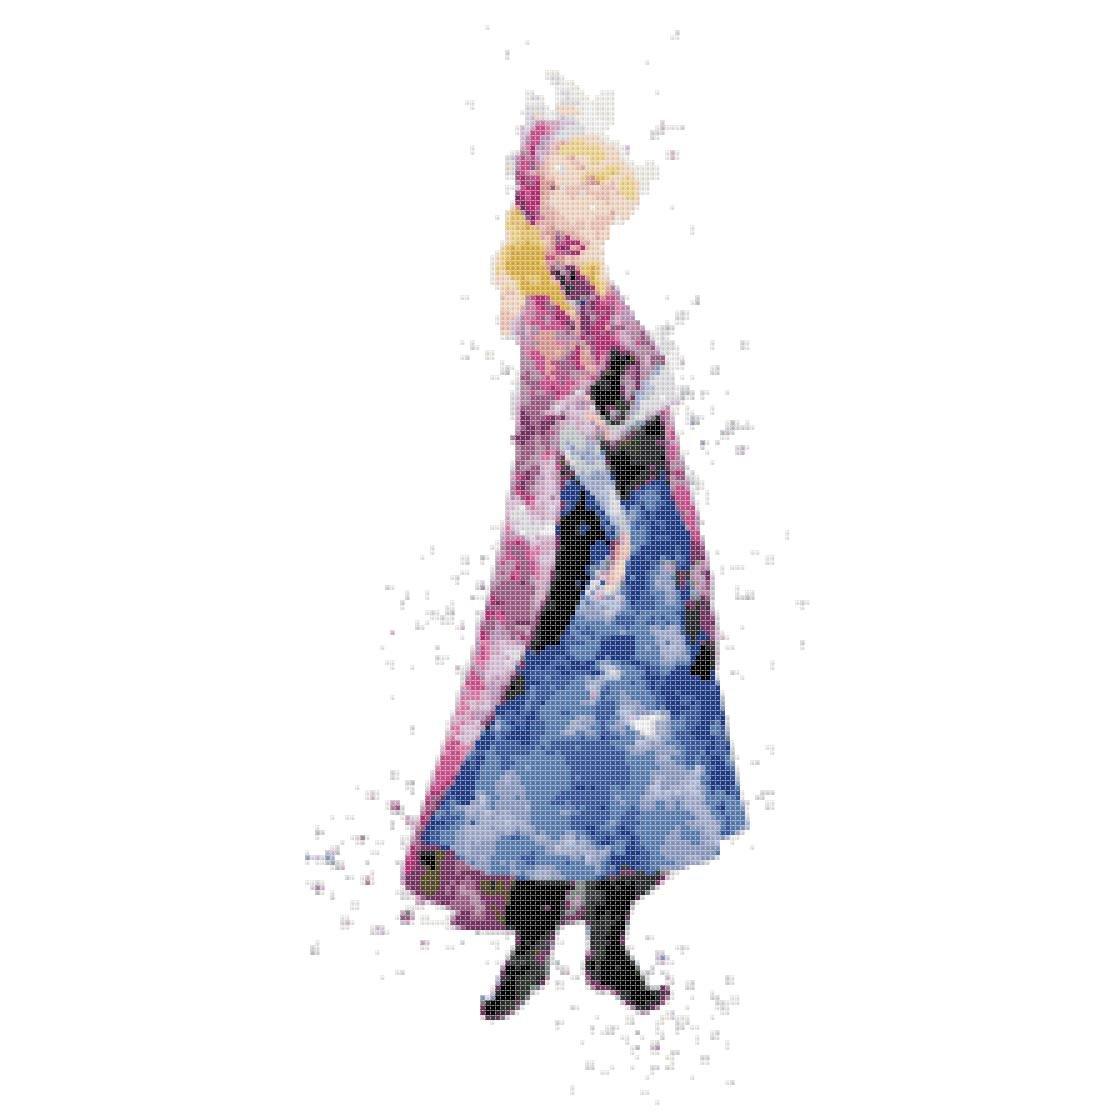 counted cross stitch pattern princess anna watercolor 101 * 216 stitches E1879